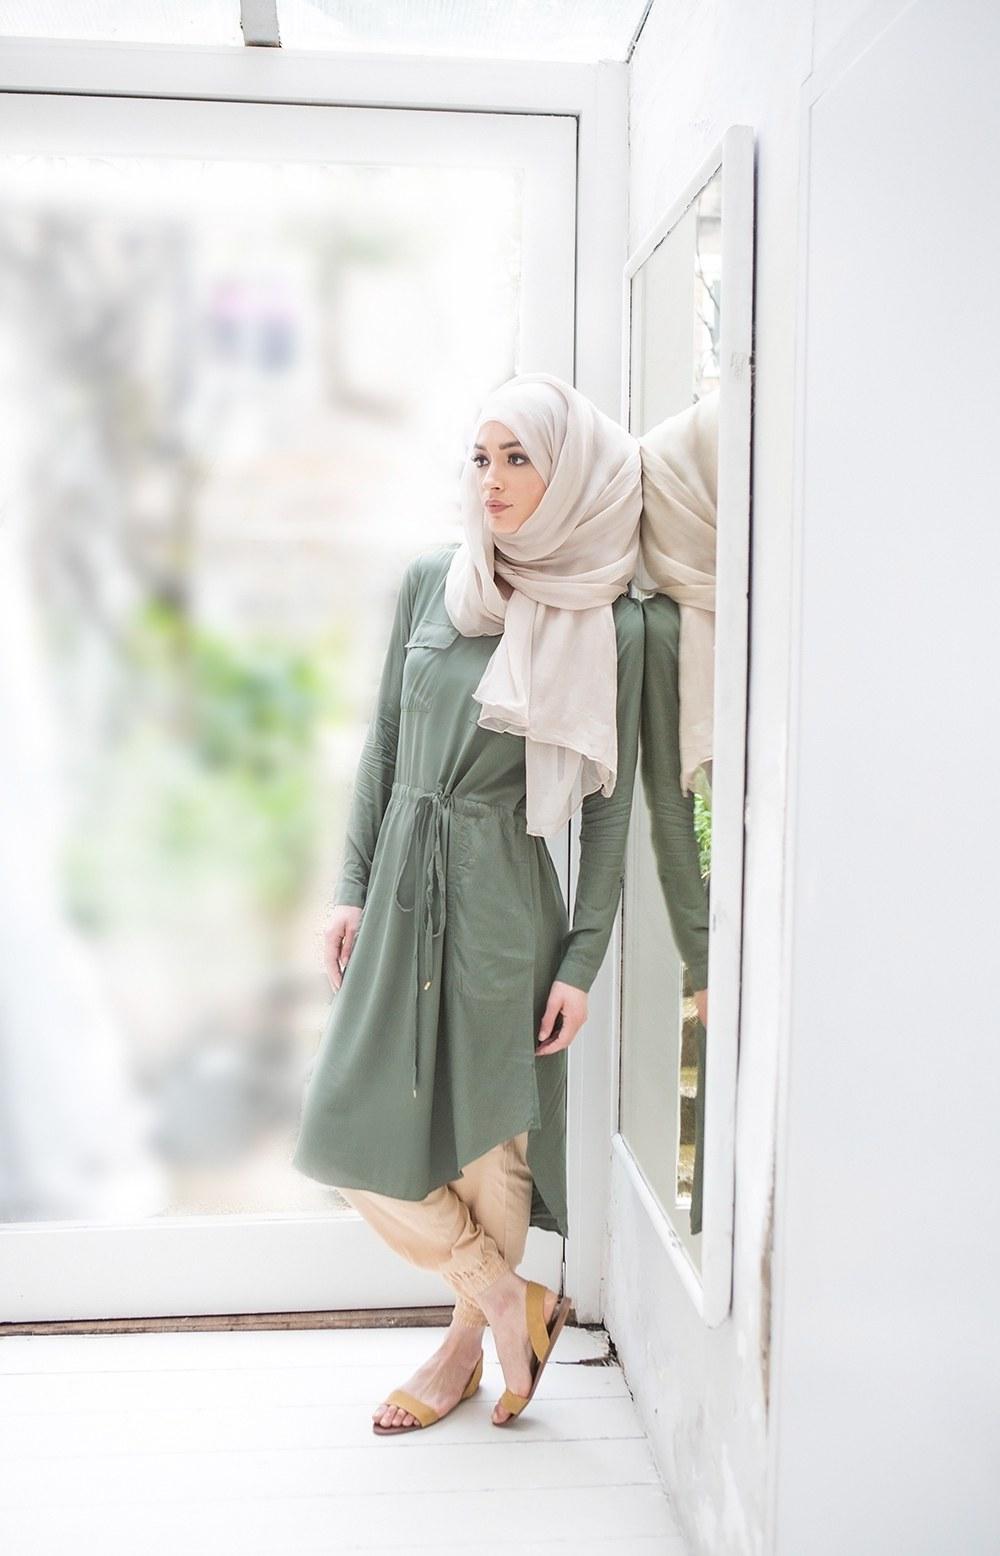 Ide Baju Lebaran Sekarang Fmdf 25 Trend Model Baju Muslim Lebaran 2018 Simple & Modis